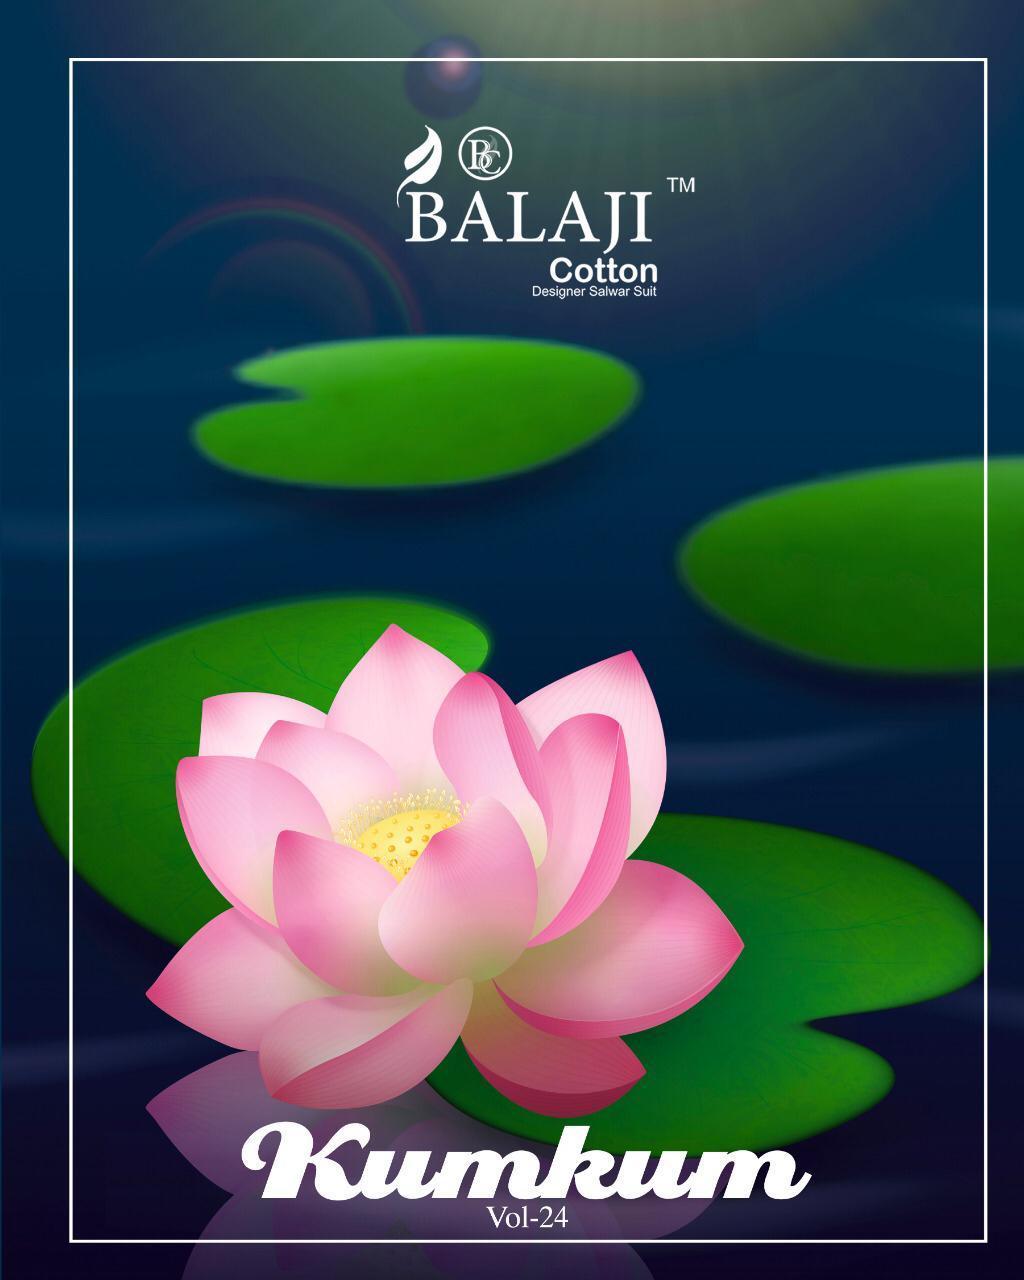 Balaji-Kumkum-vol-24-1